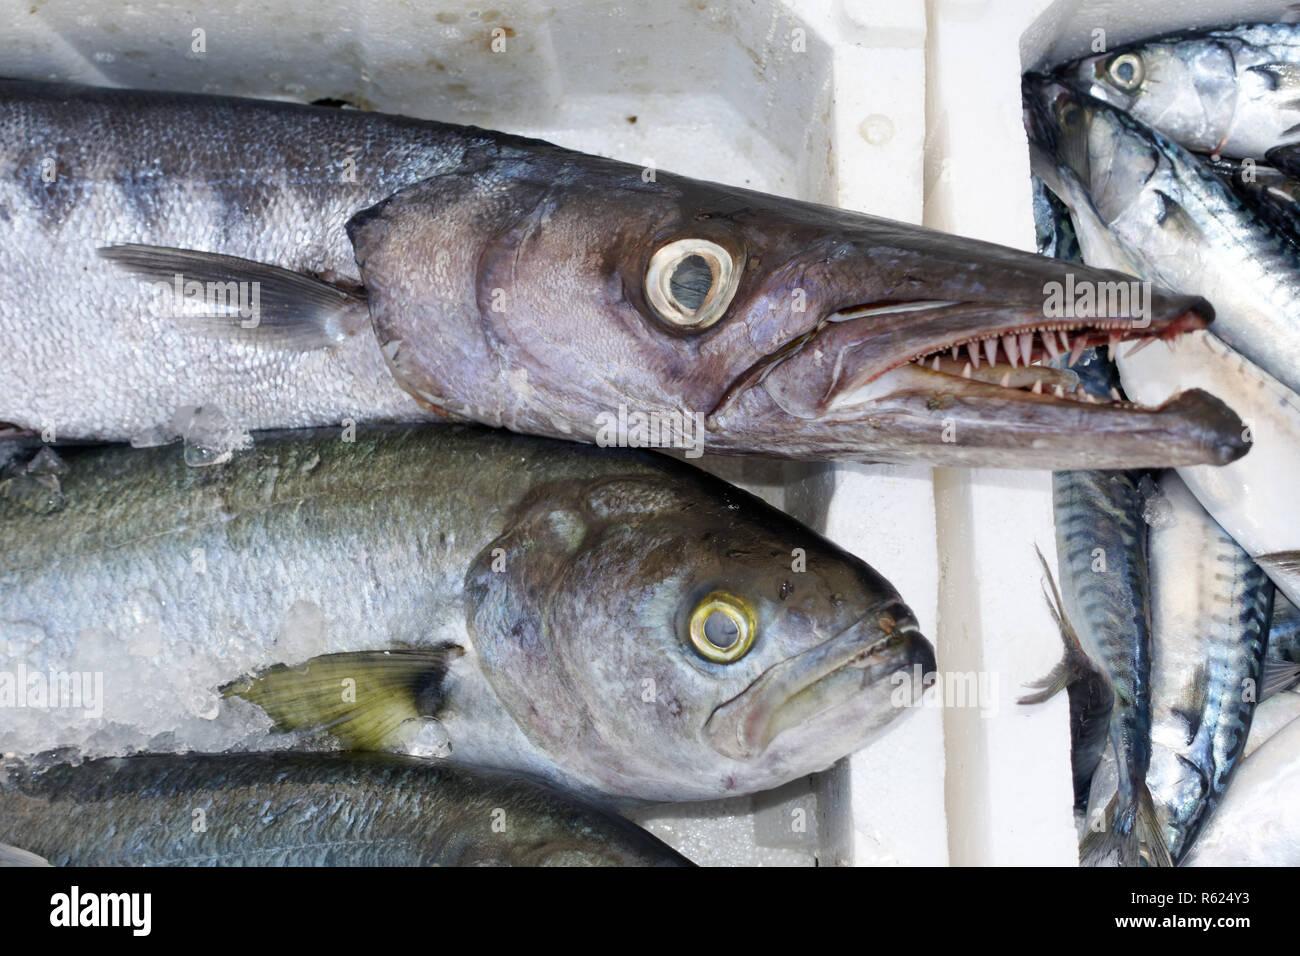 fish market barracuda Stock Photo